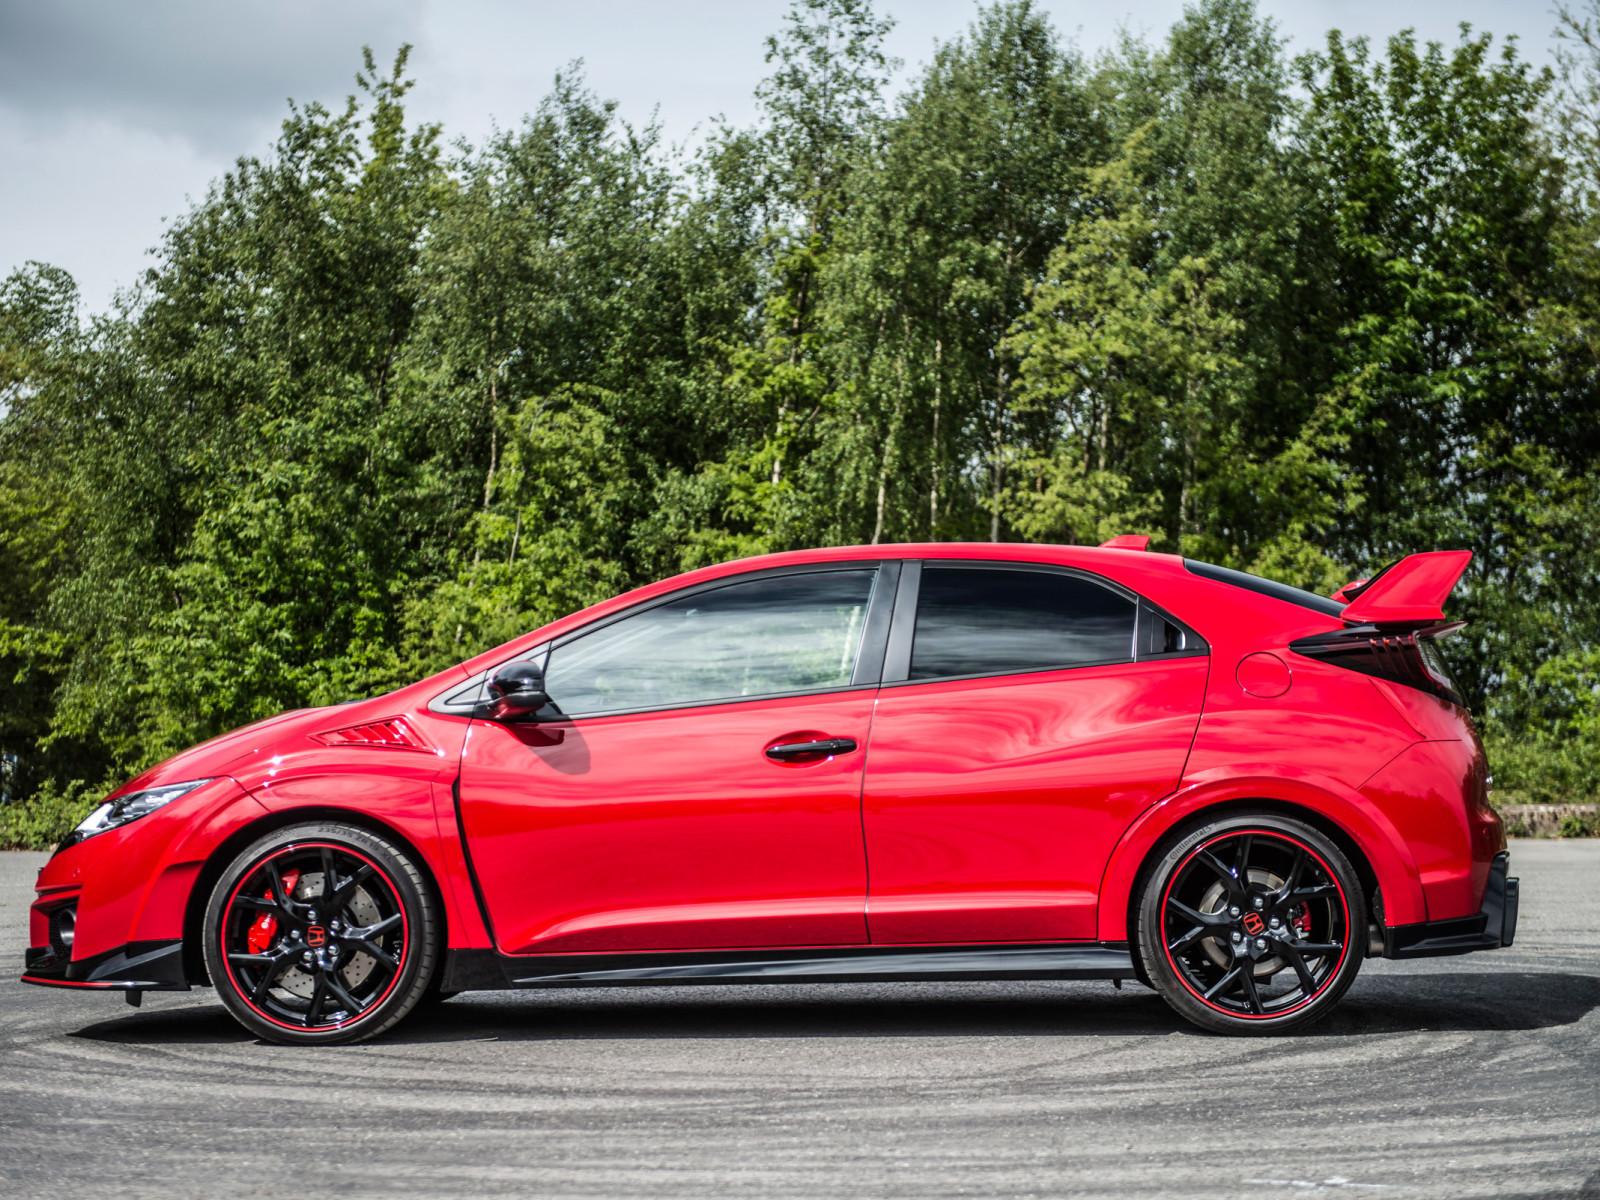 Civic Type R Red RHD HD Wallpaper 6245 1600x1200